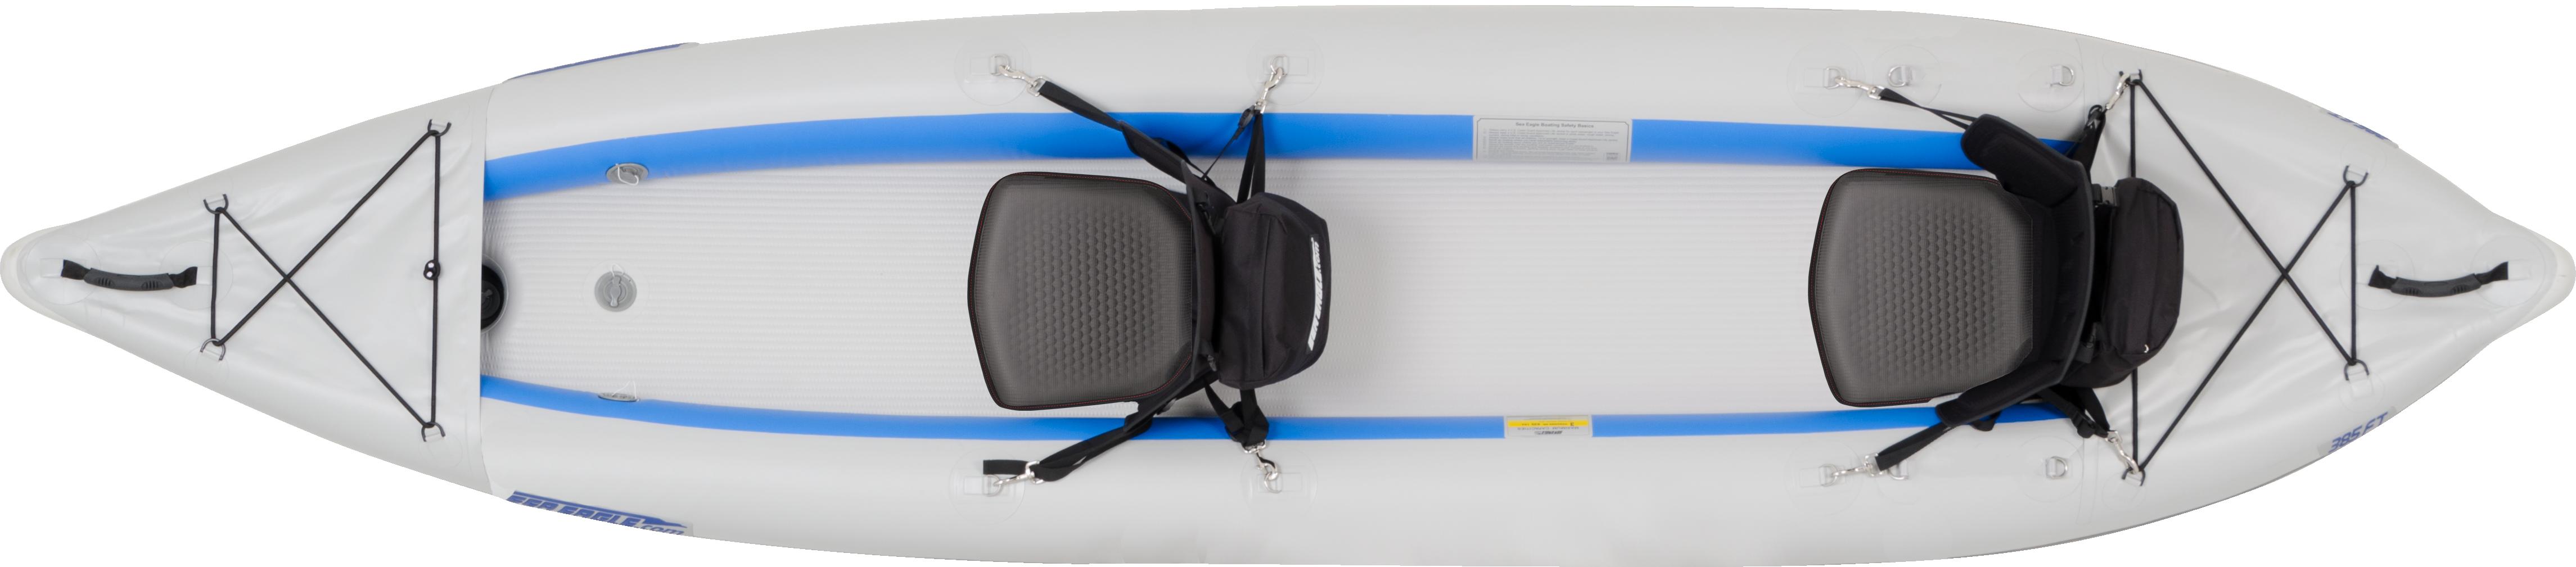 Kayaks: FastTrack 385ft by Sea Eagle - Image 4490